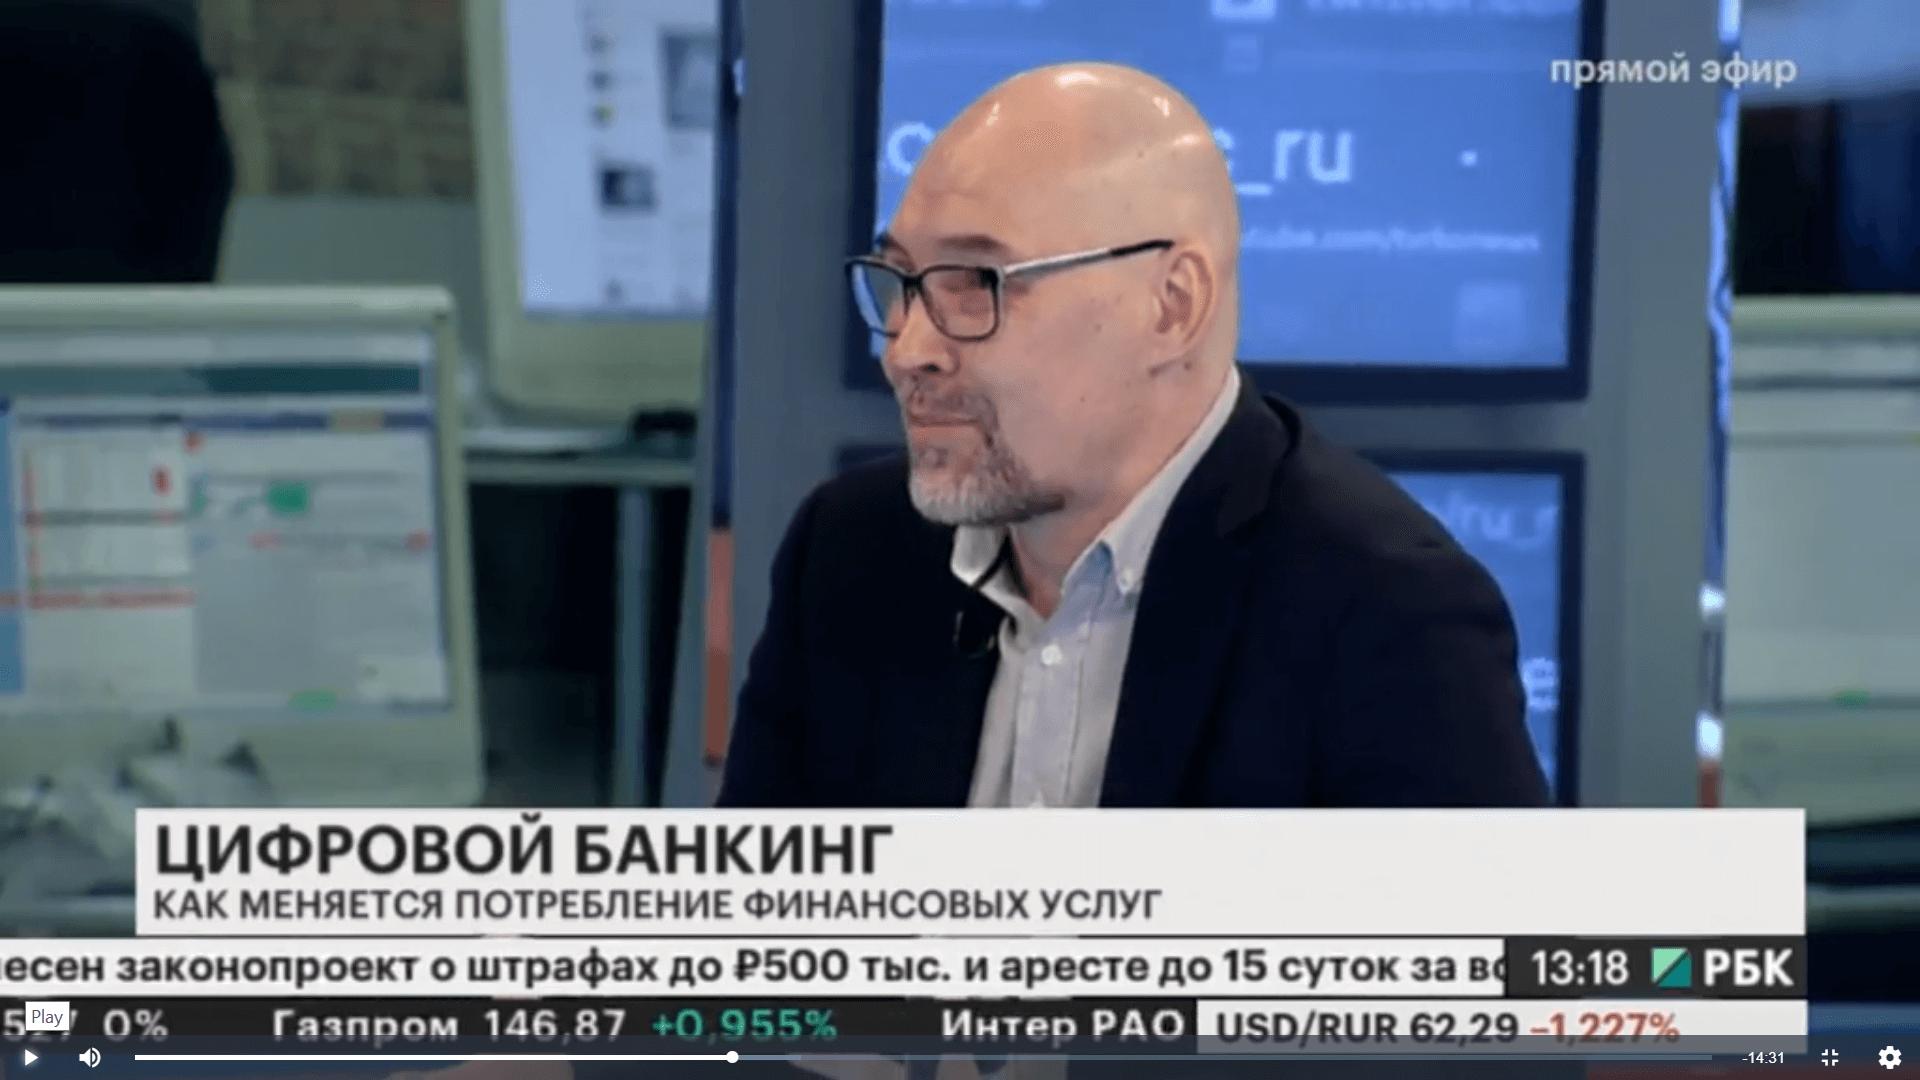 Перспективы развития ДБО. Дмитрий Сатин в передаче Кирилла Токарева «Дело»